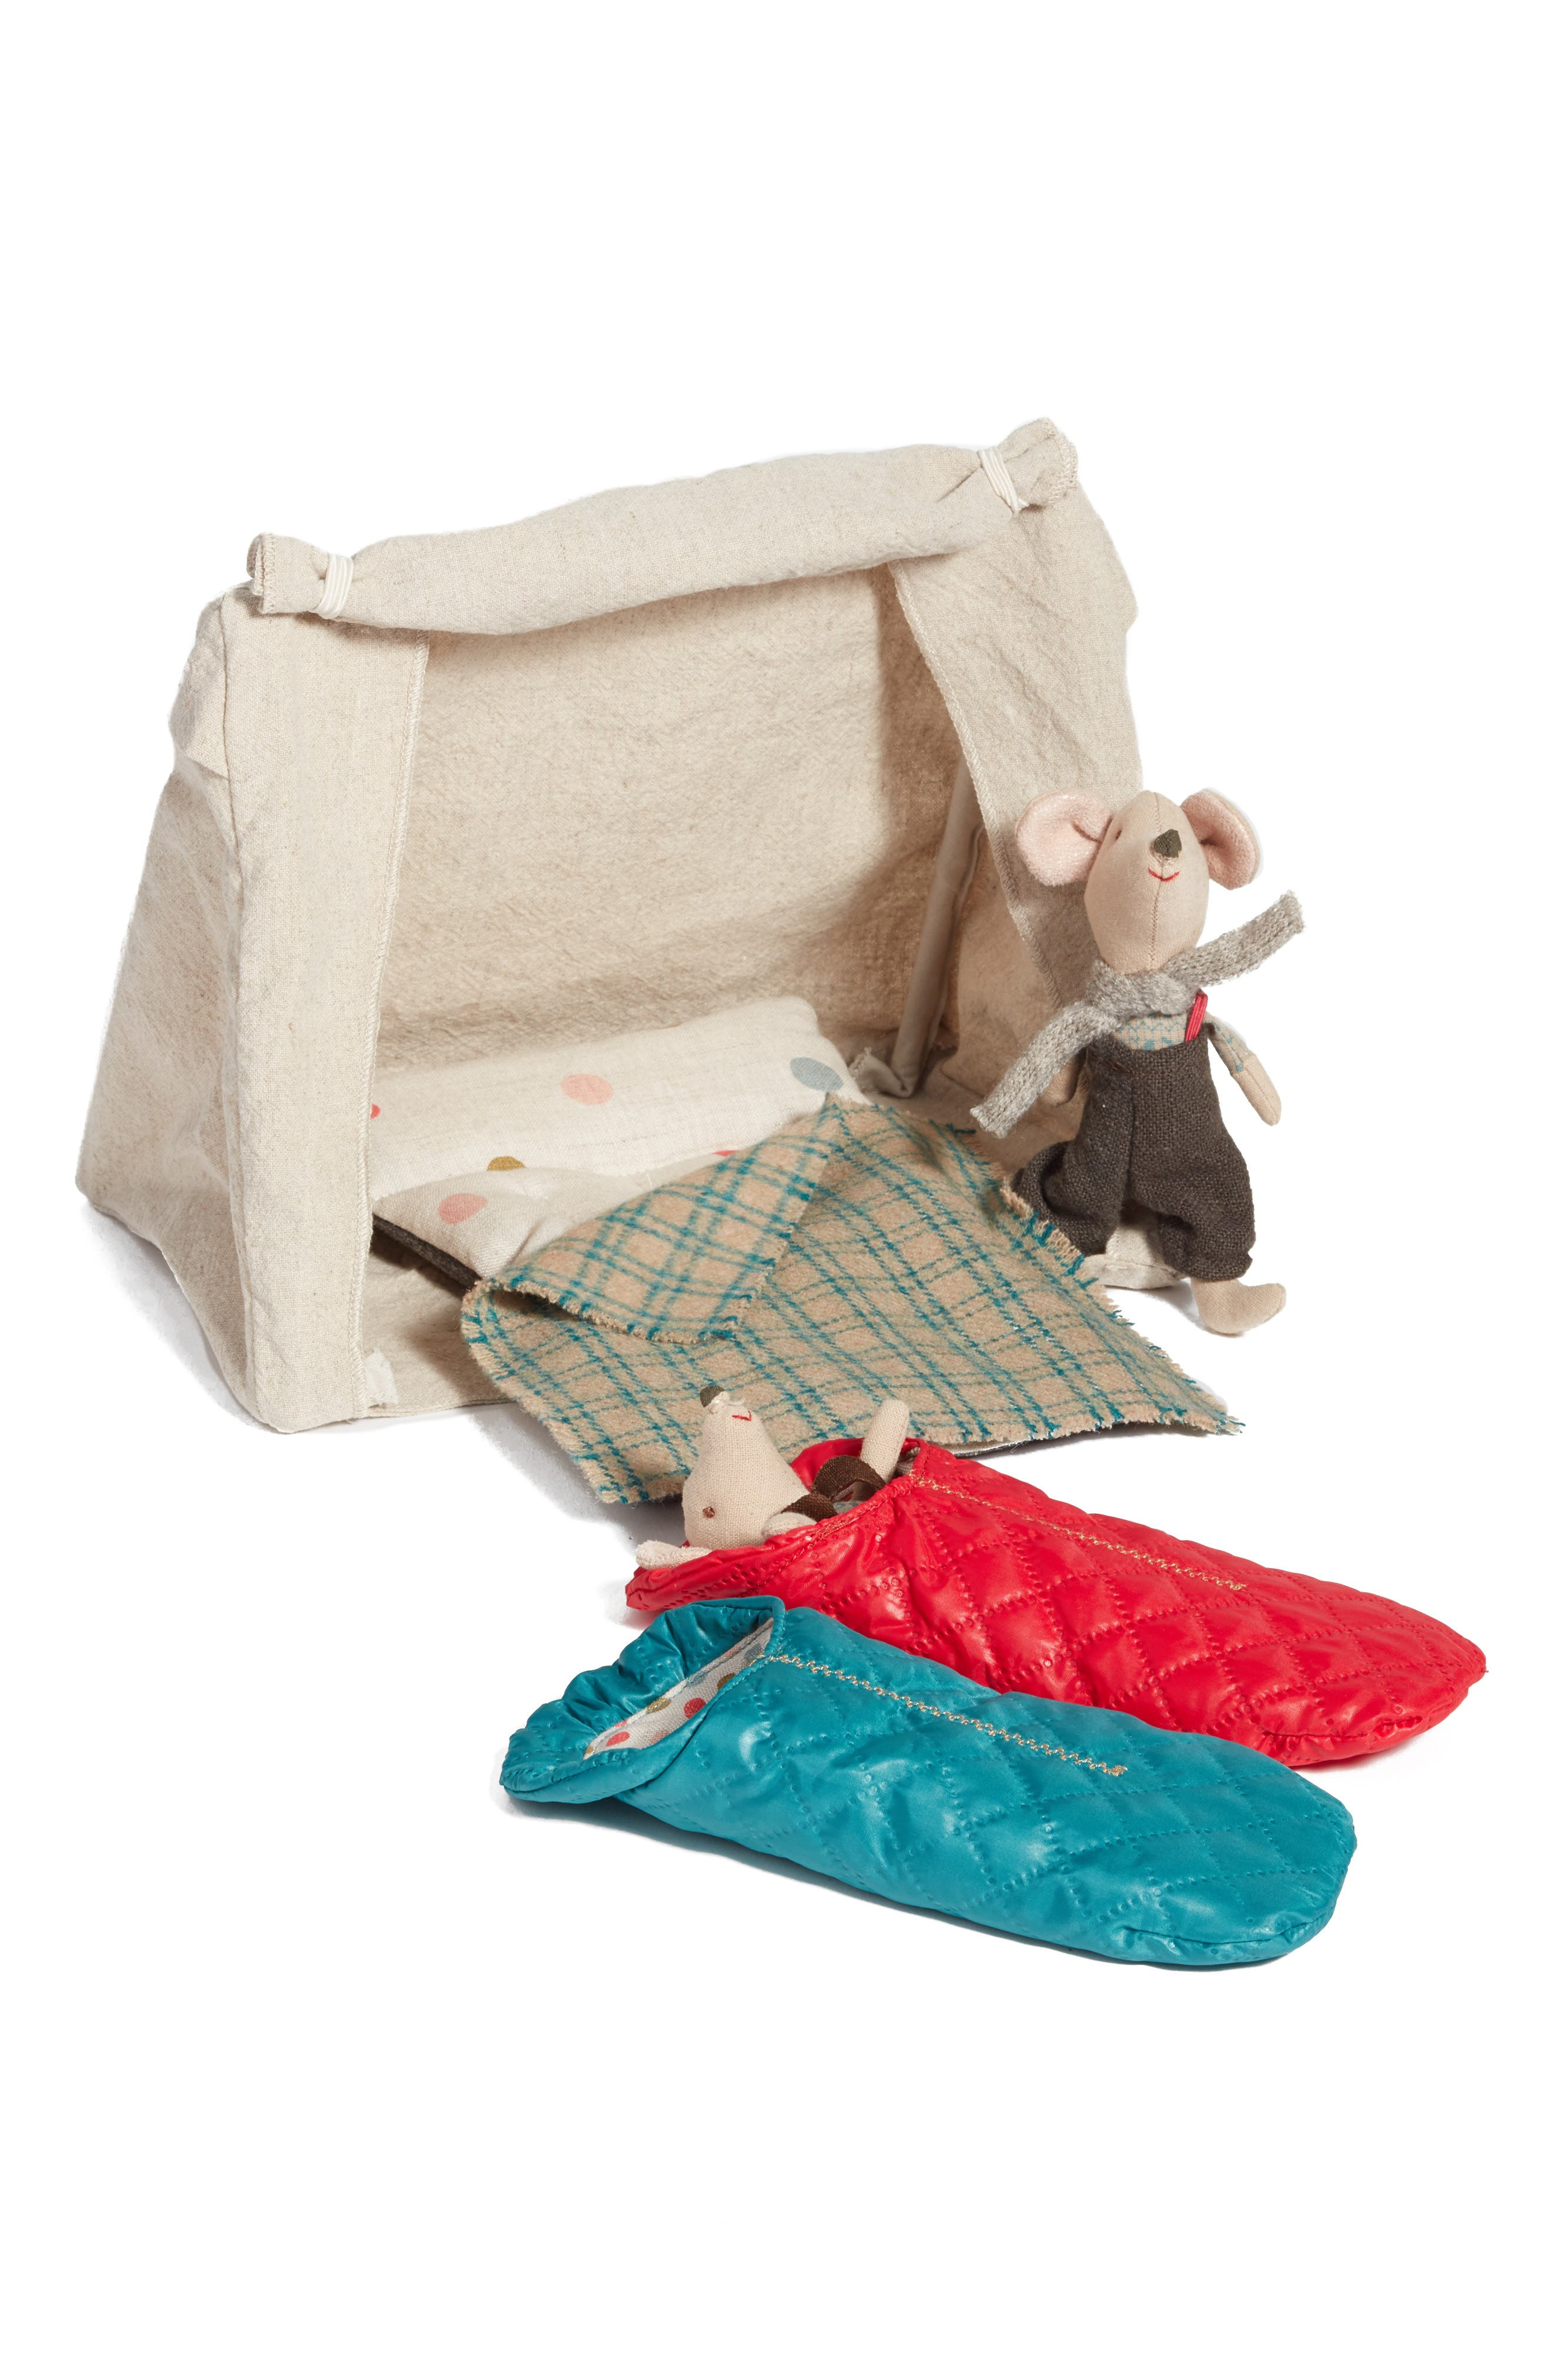 Mouse Tent 5-Piece Play Set,                         Main,                         color, Multi